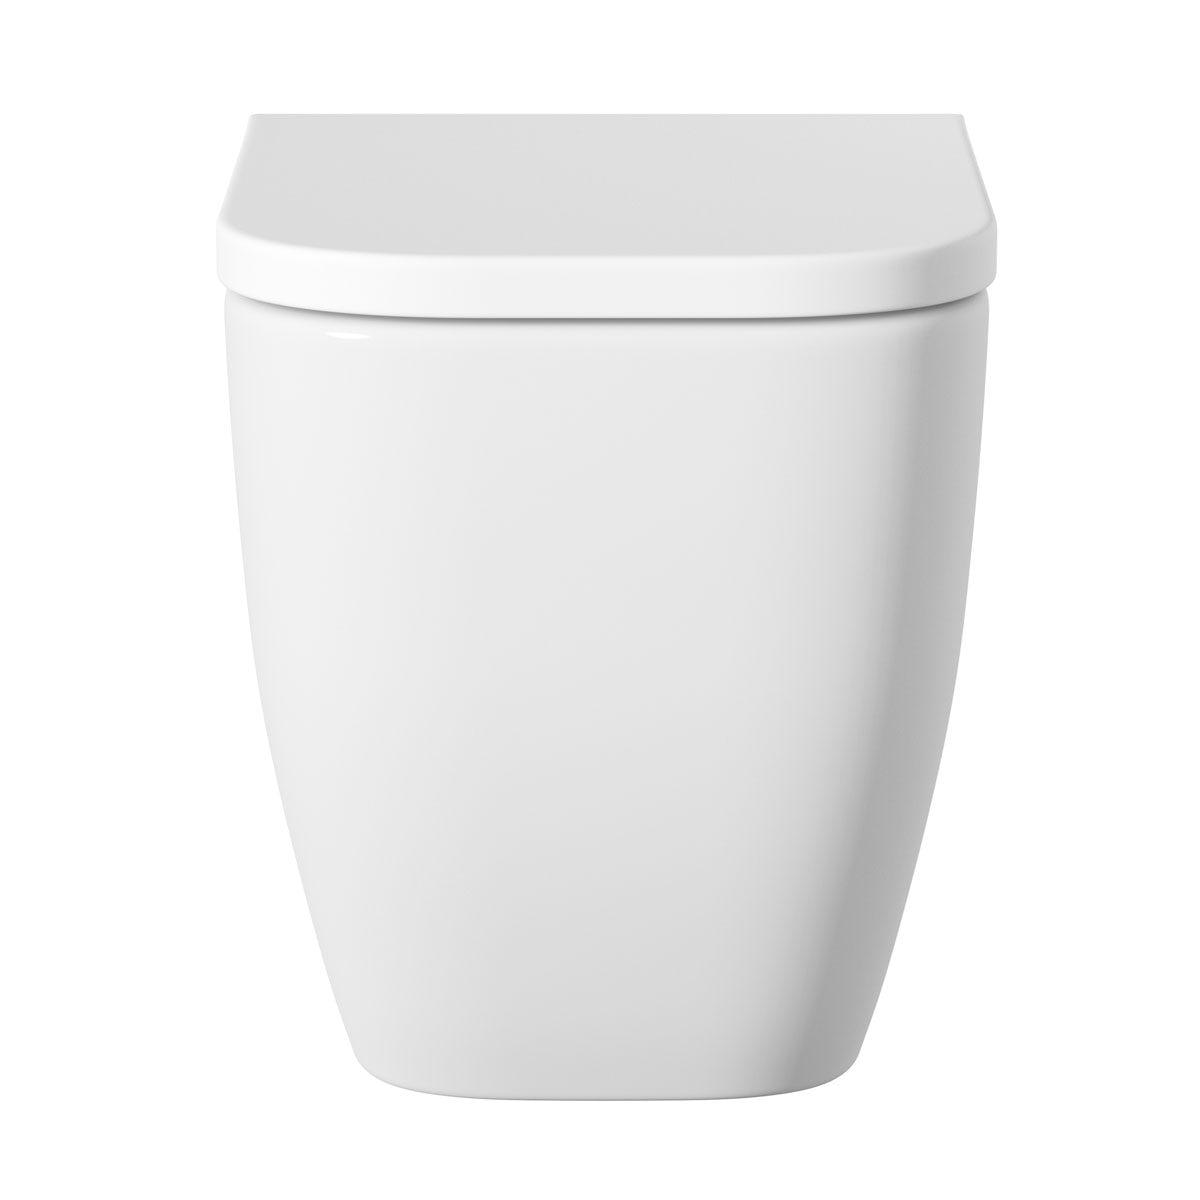 Mode Ellis Back To Wall Toilet Inc Soft Close Seat